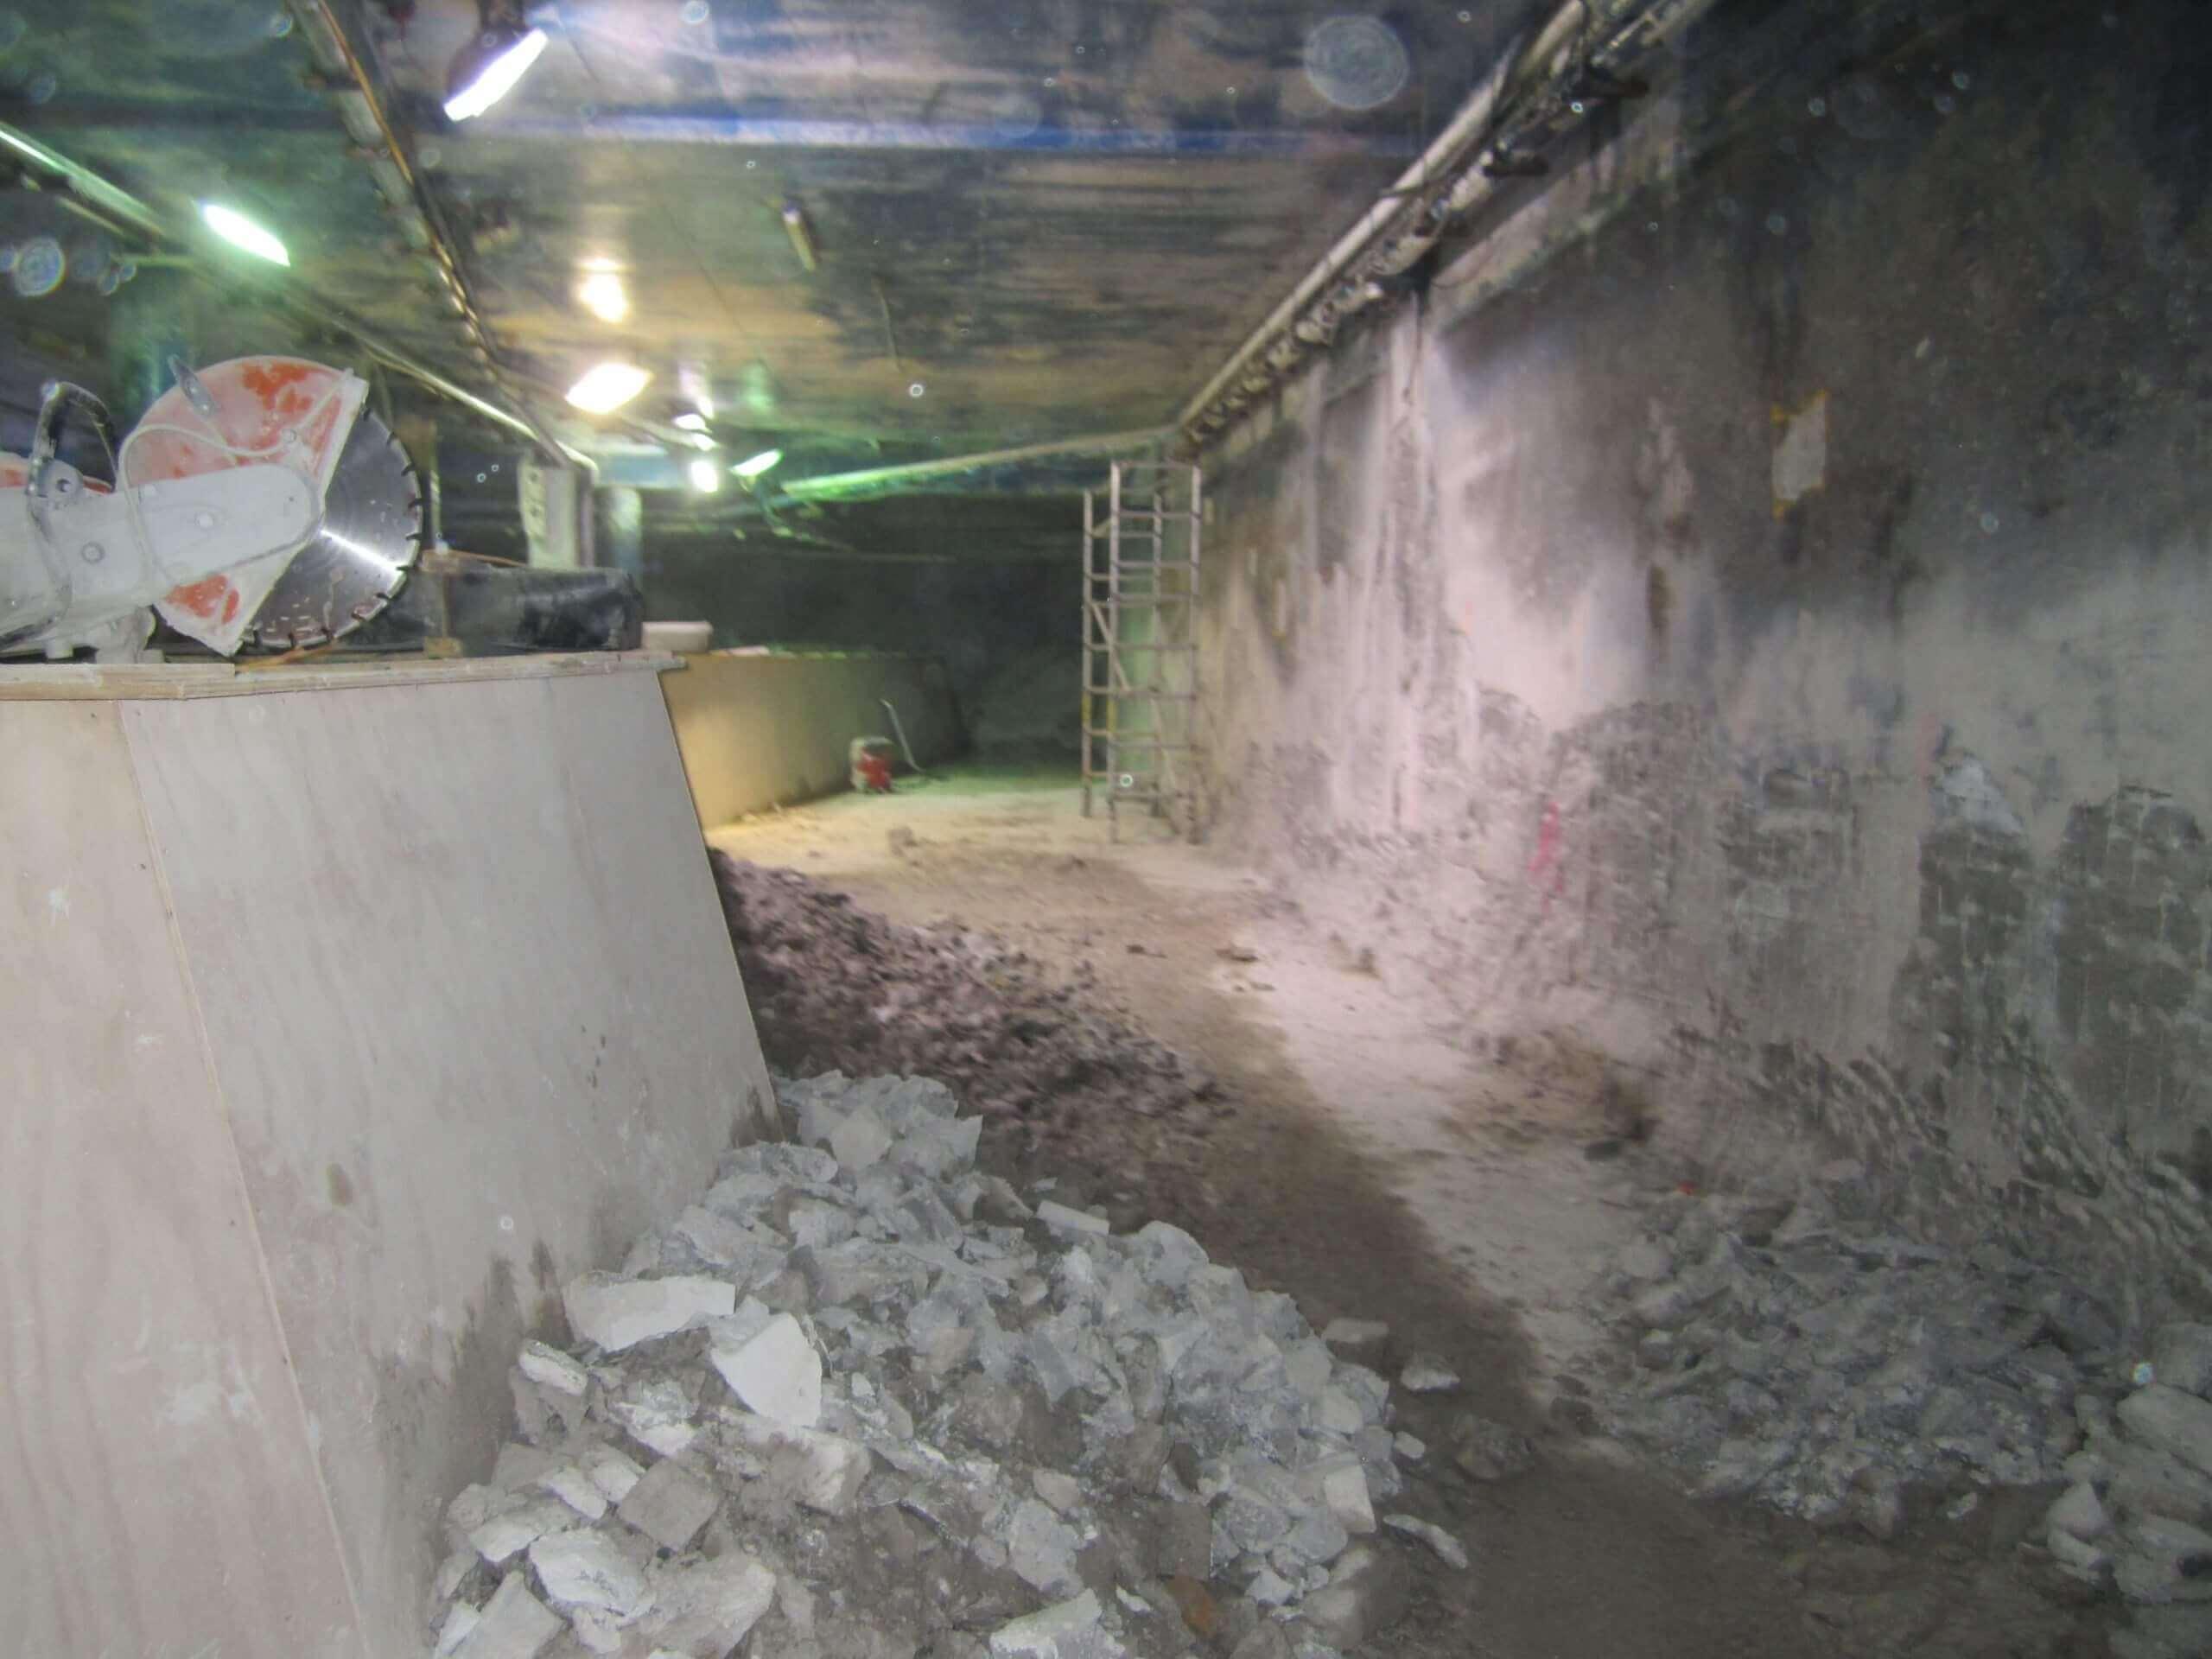 Concrete Repair Work - Structural Repair - Remedial Building Services